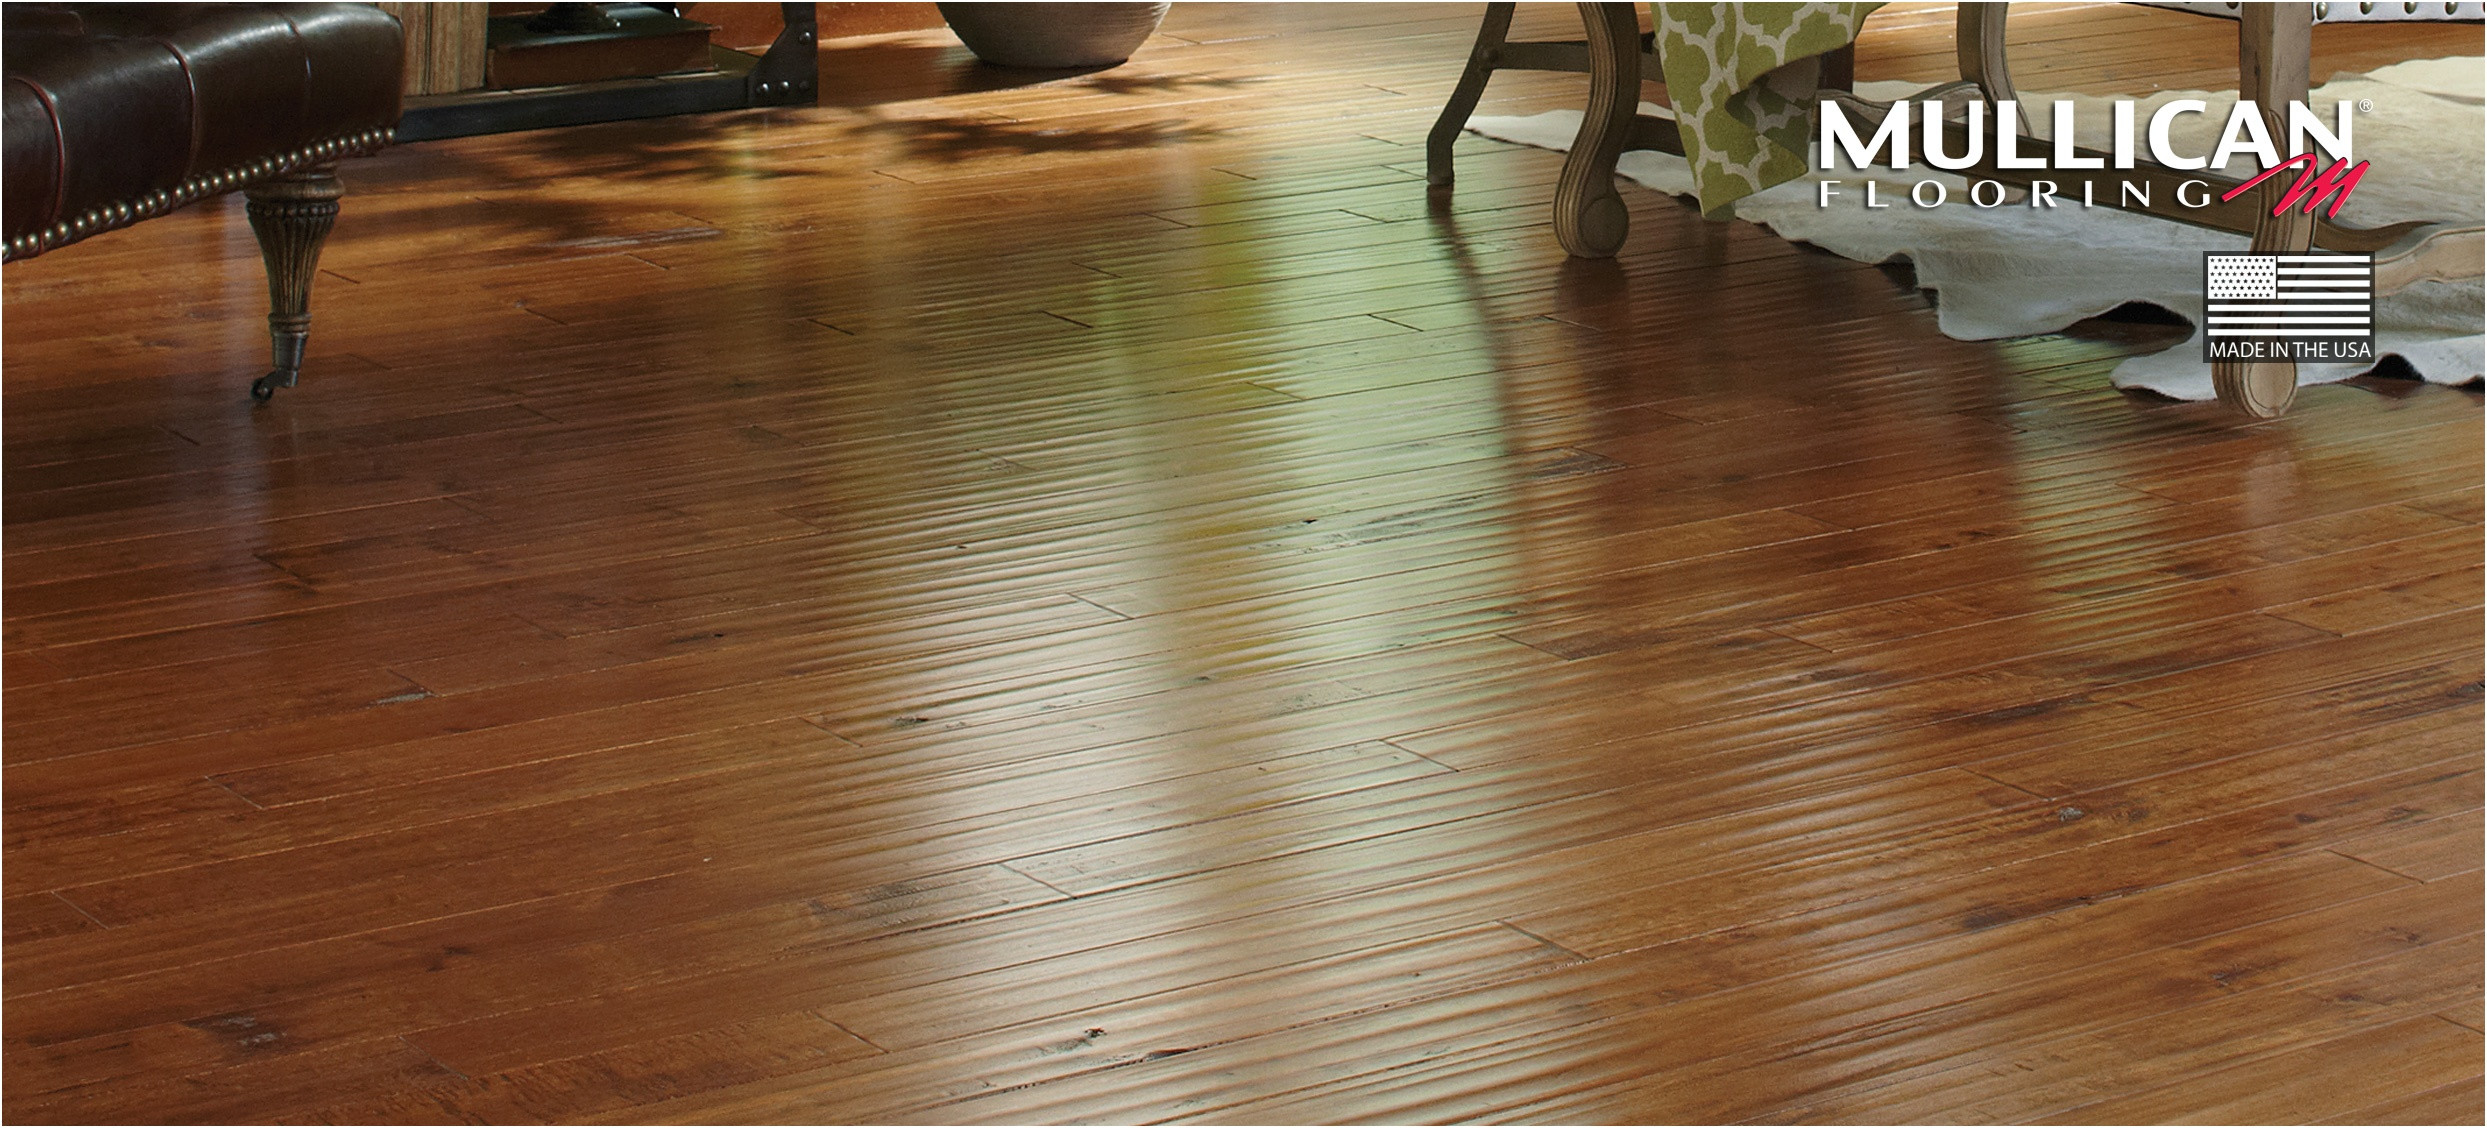 engineered hardwood flooring made in usa of engineered wood flooring vs hardwood luxury the pros and cons of inside engineered wood flooring vs hardwood luxury mullican flooring home of engineered wood flooring vs hardwood luxury